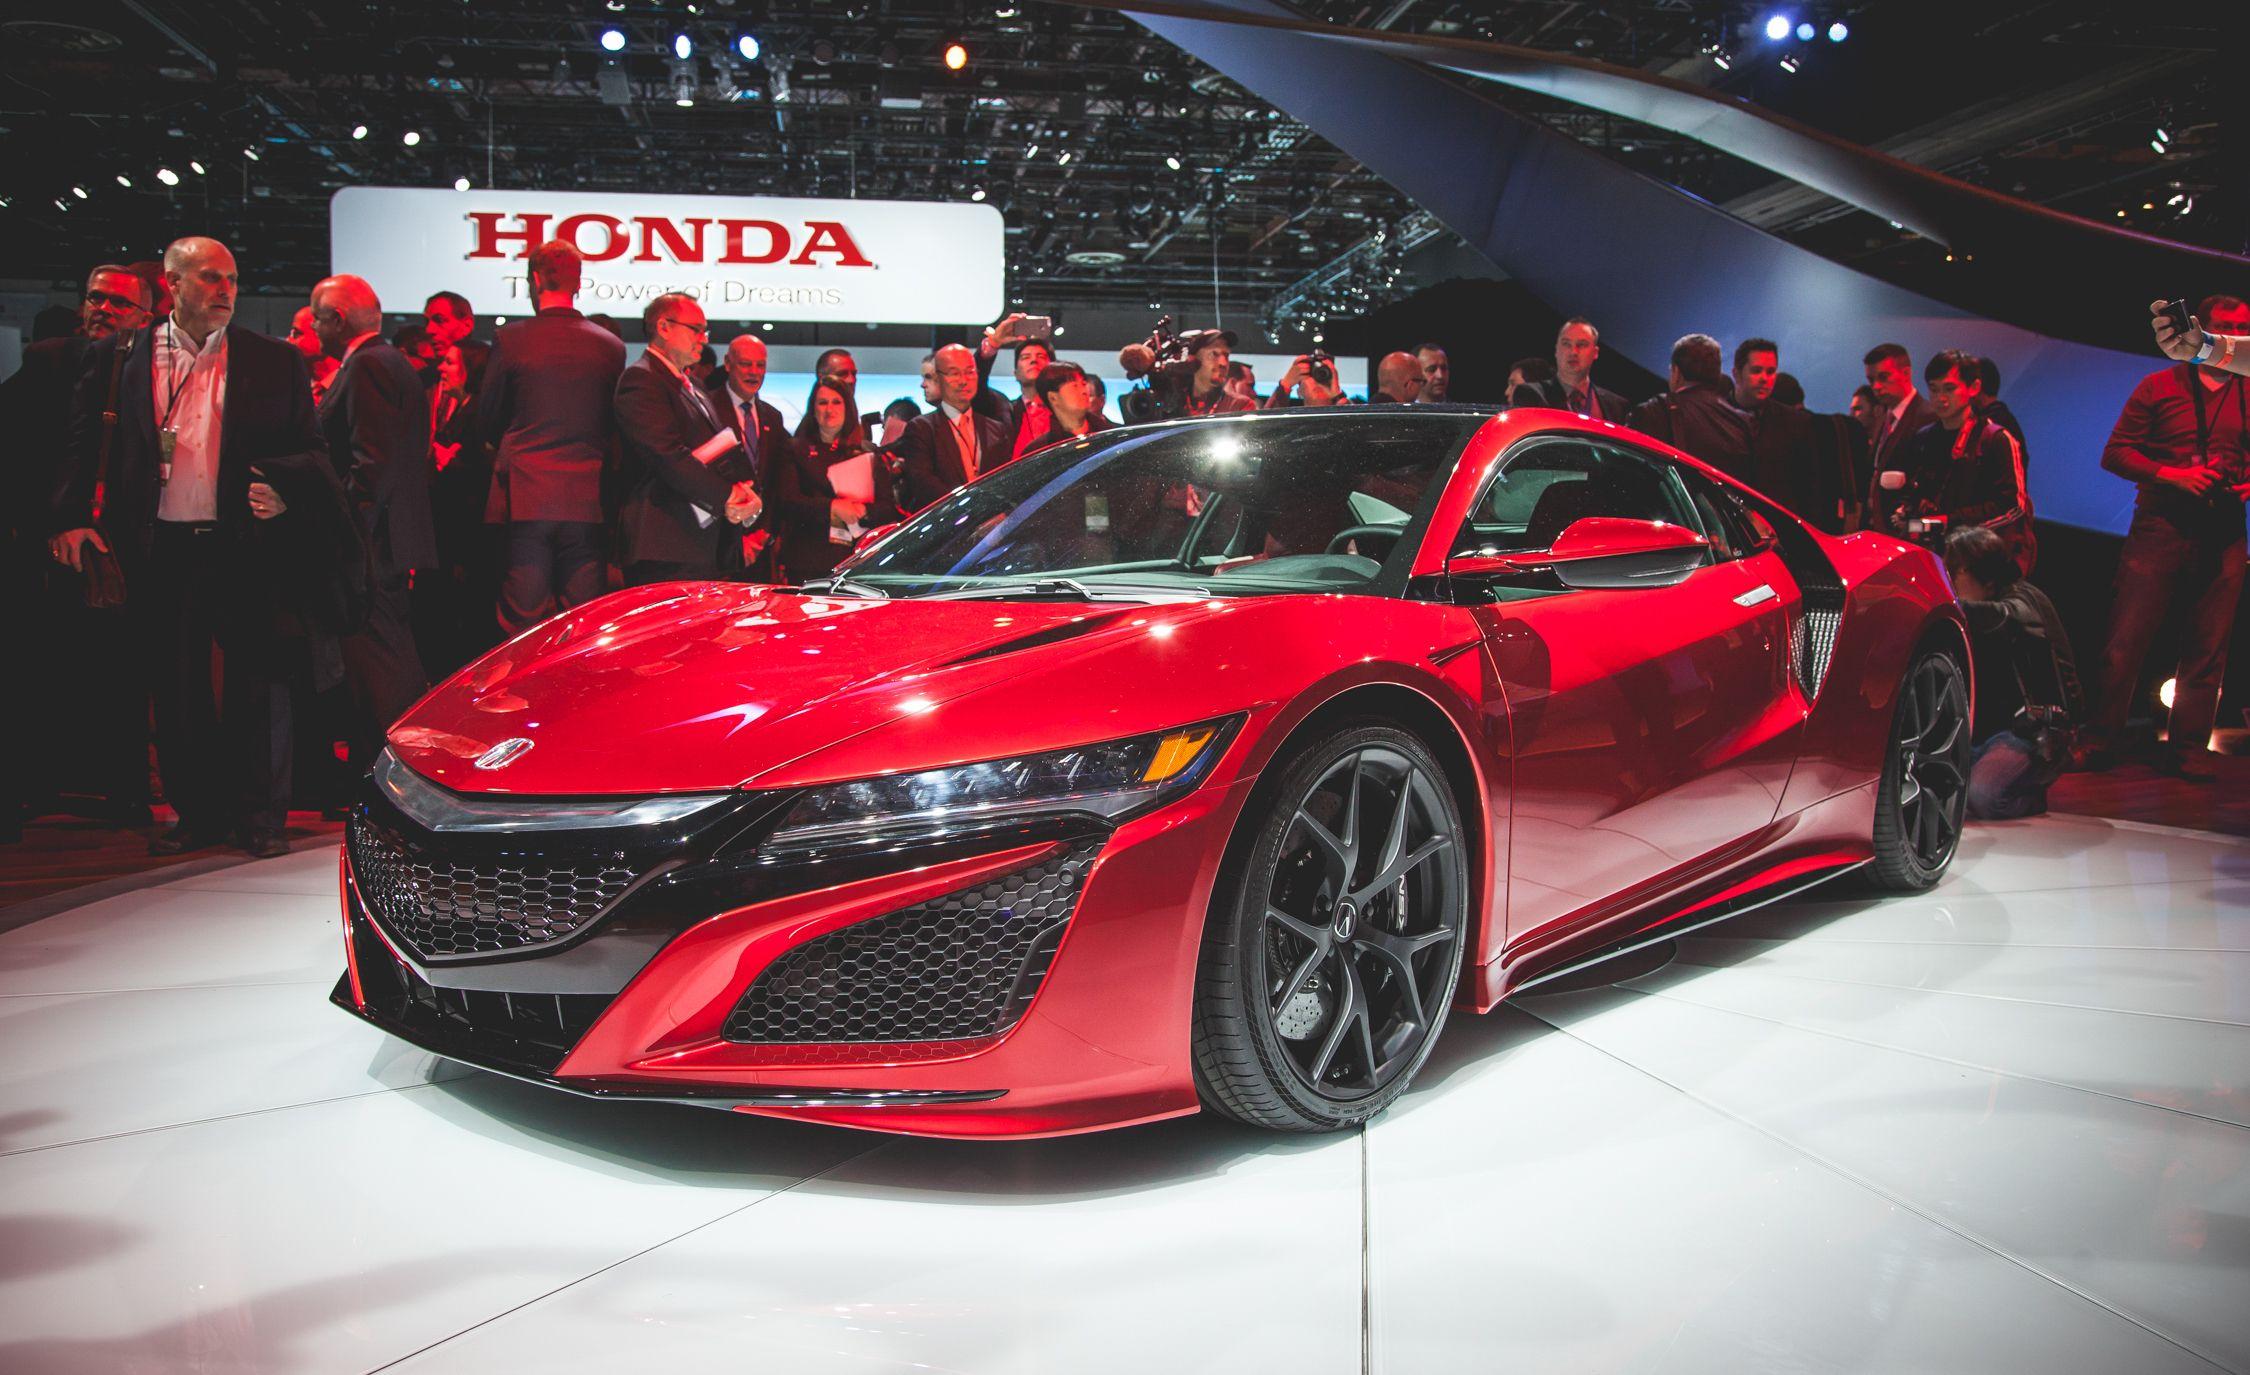 2016 Acura NSX Photos and Info  News  Car and Driver